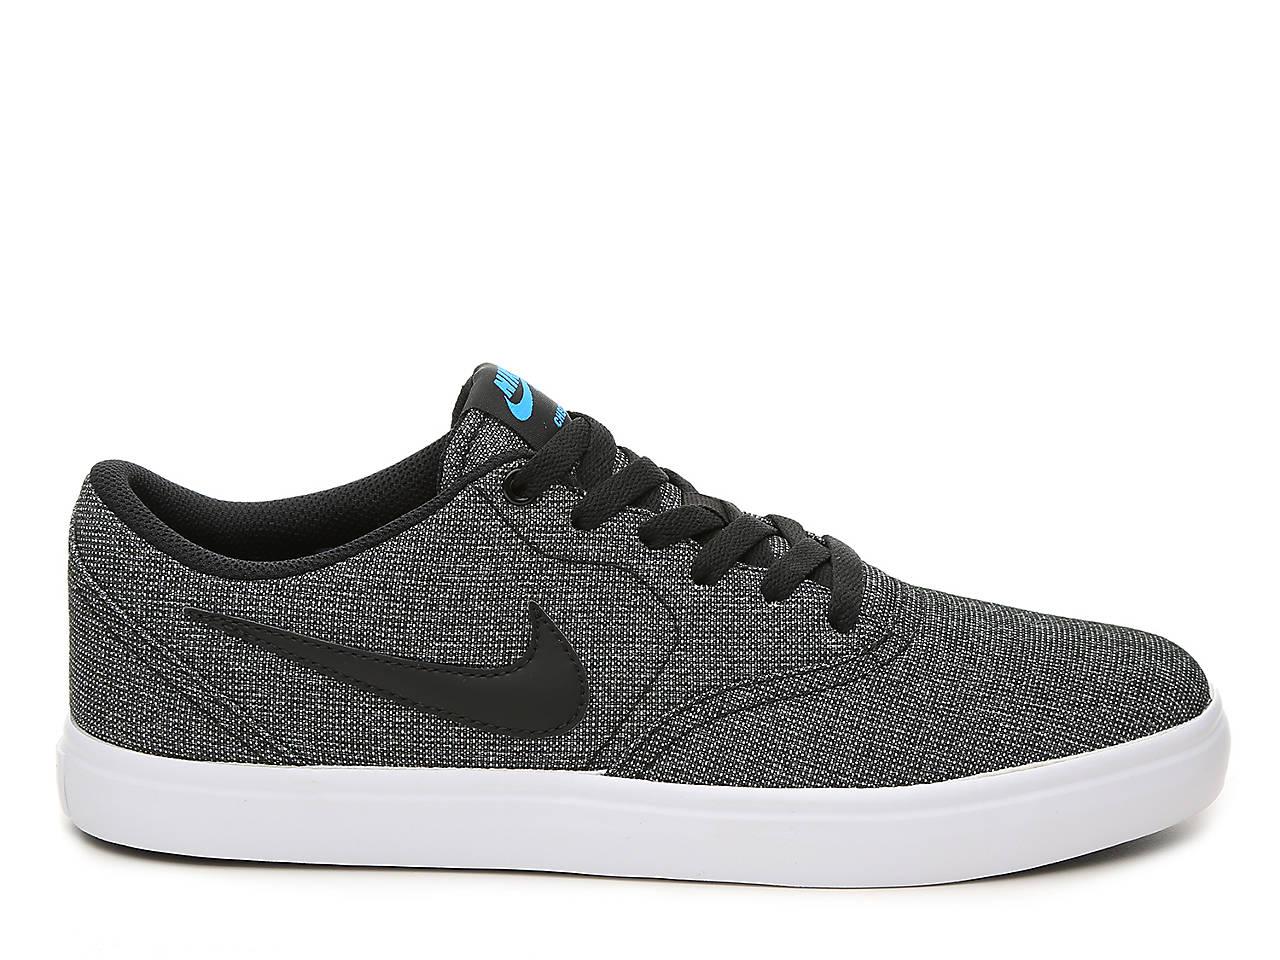 b515ff469da Nike SB Check Solarsoft Sneaker - Men s Men s Shoes